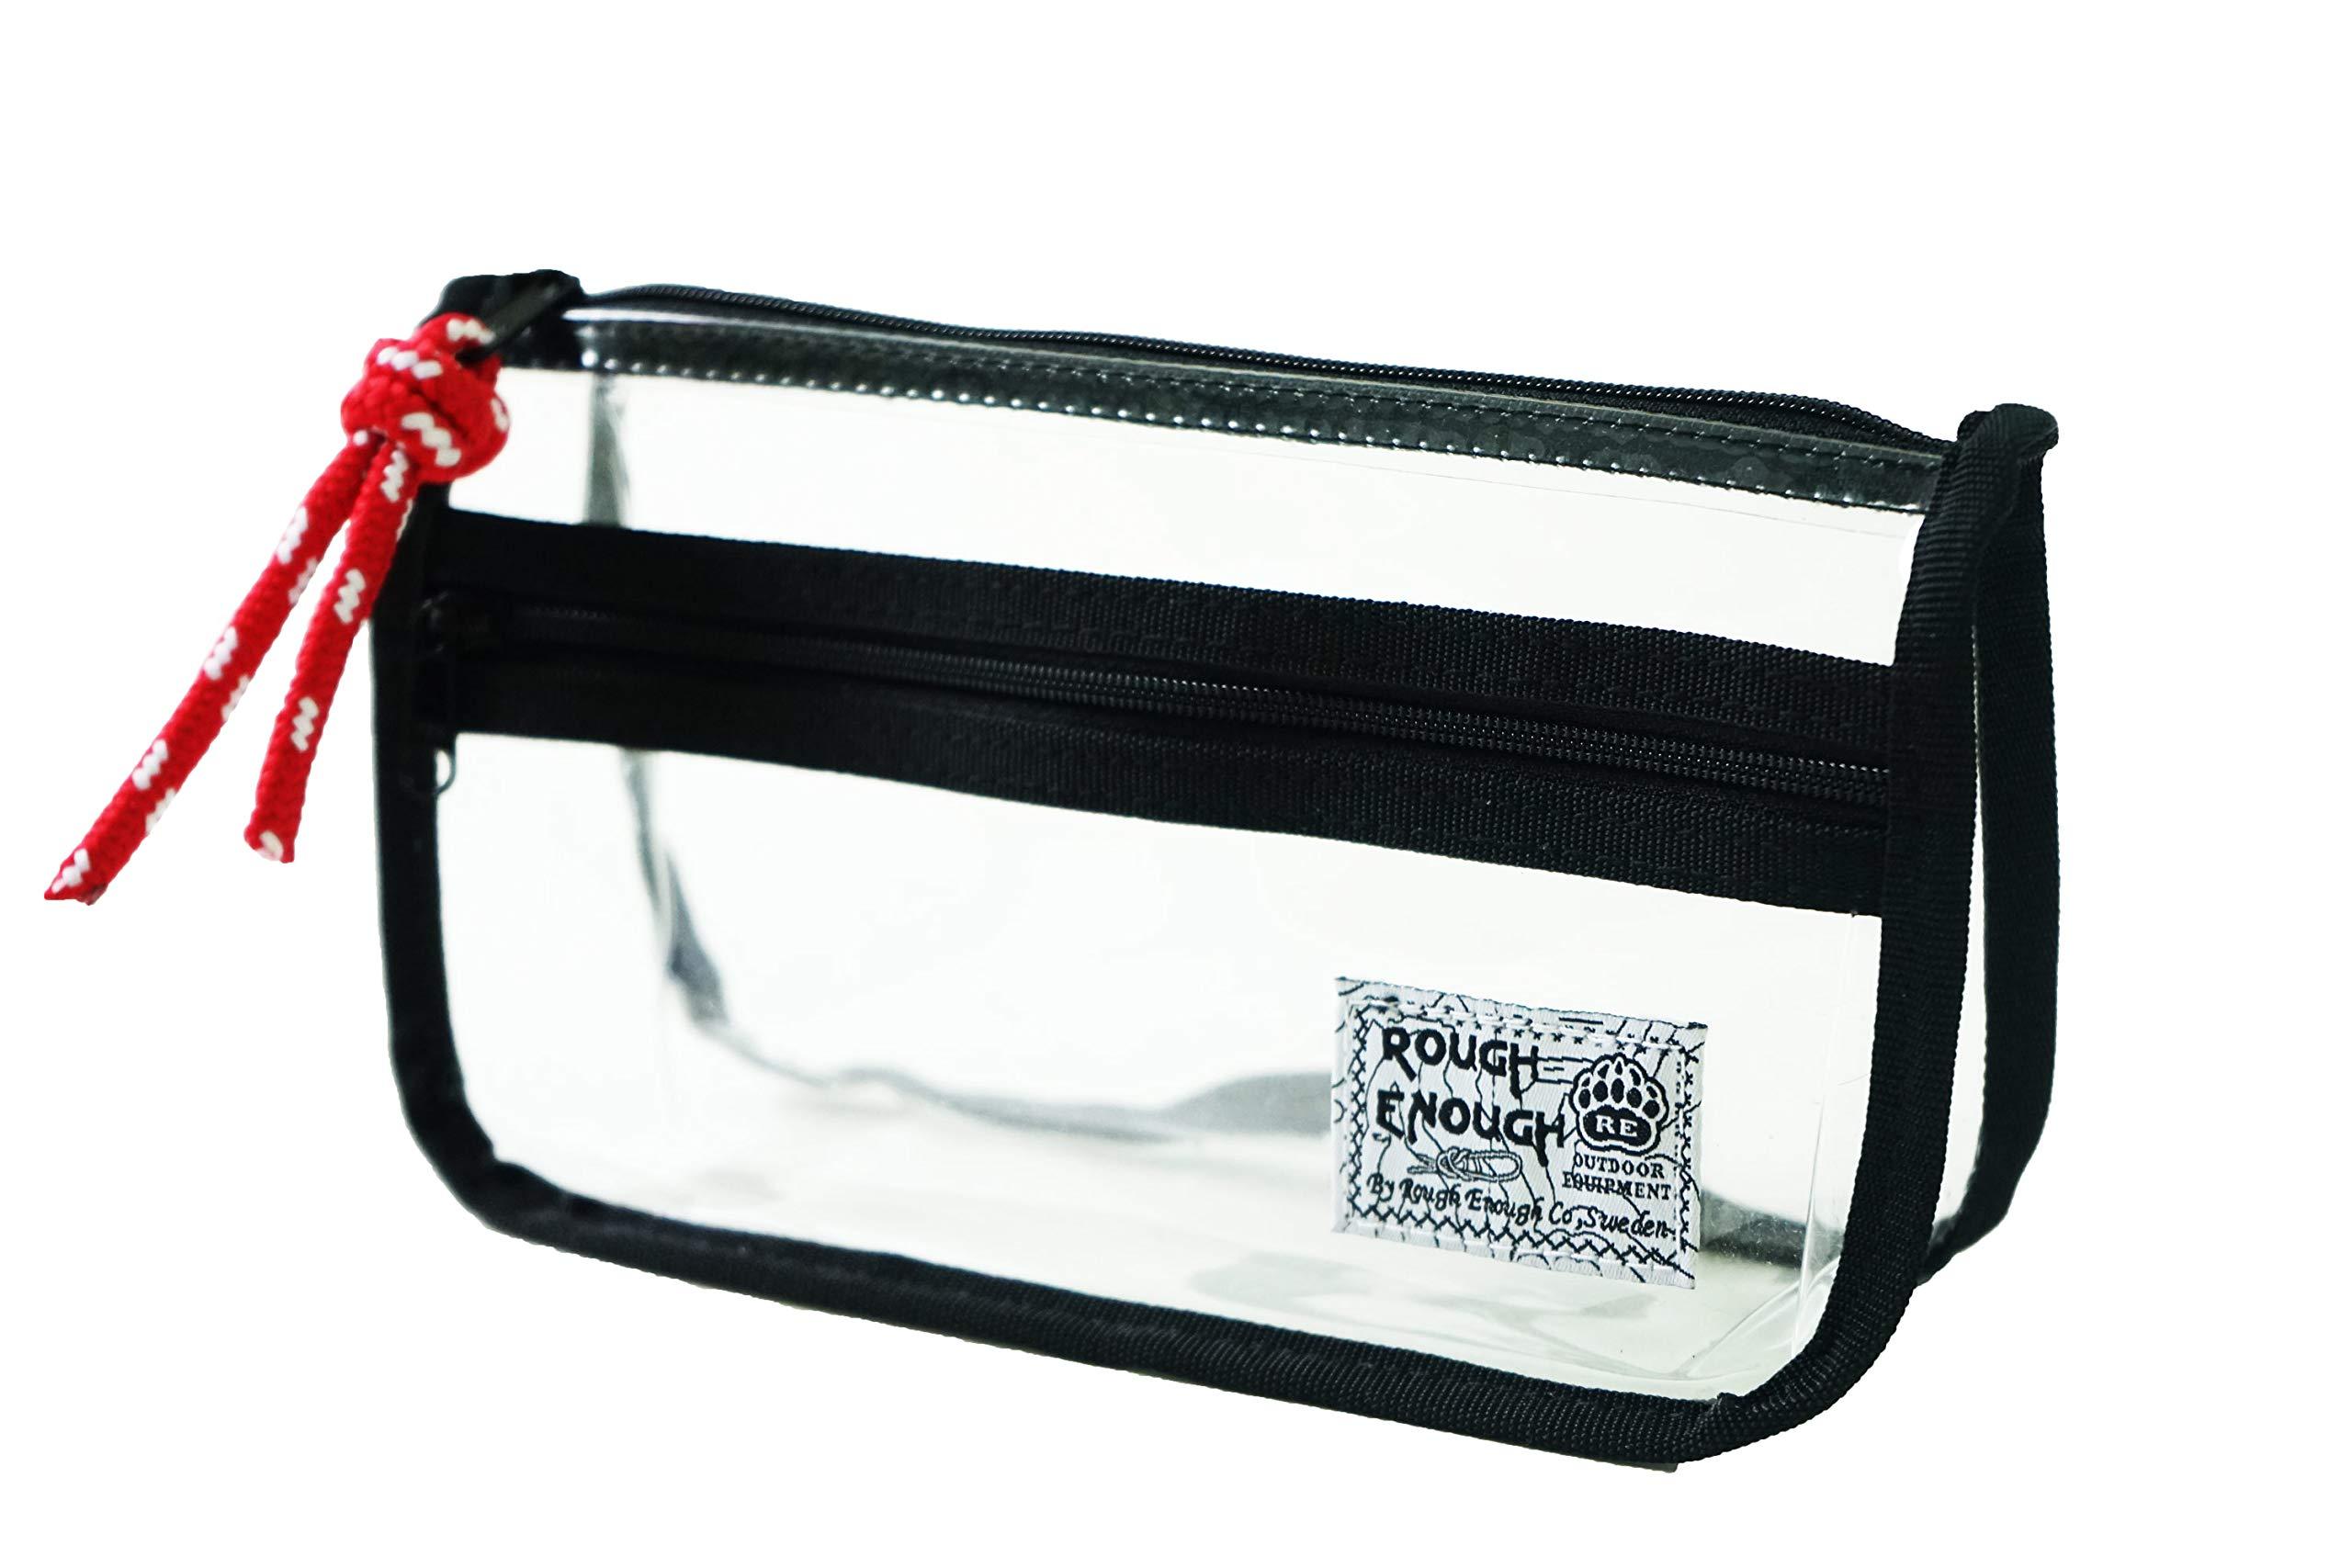 Rough Enough Vintage Clear Transparent Plastic Pencil Case Pouch Zipper Organizer Holder Waterproof Business Receipts Cosmetic Makeup Storage Bag for Boys Girls School Students Kids